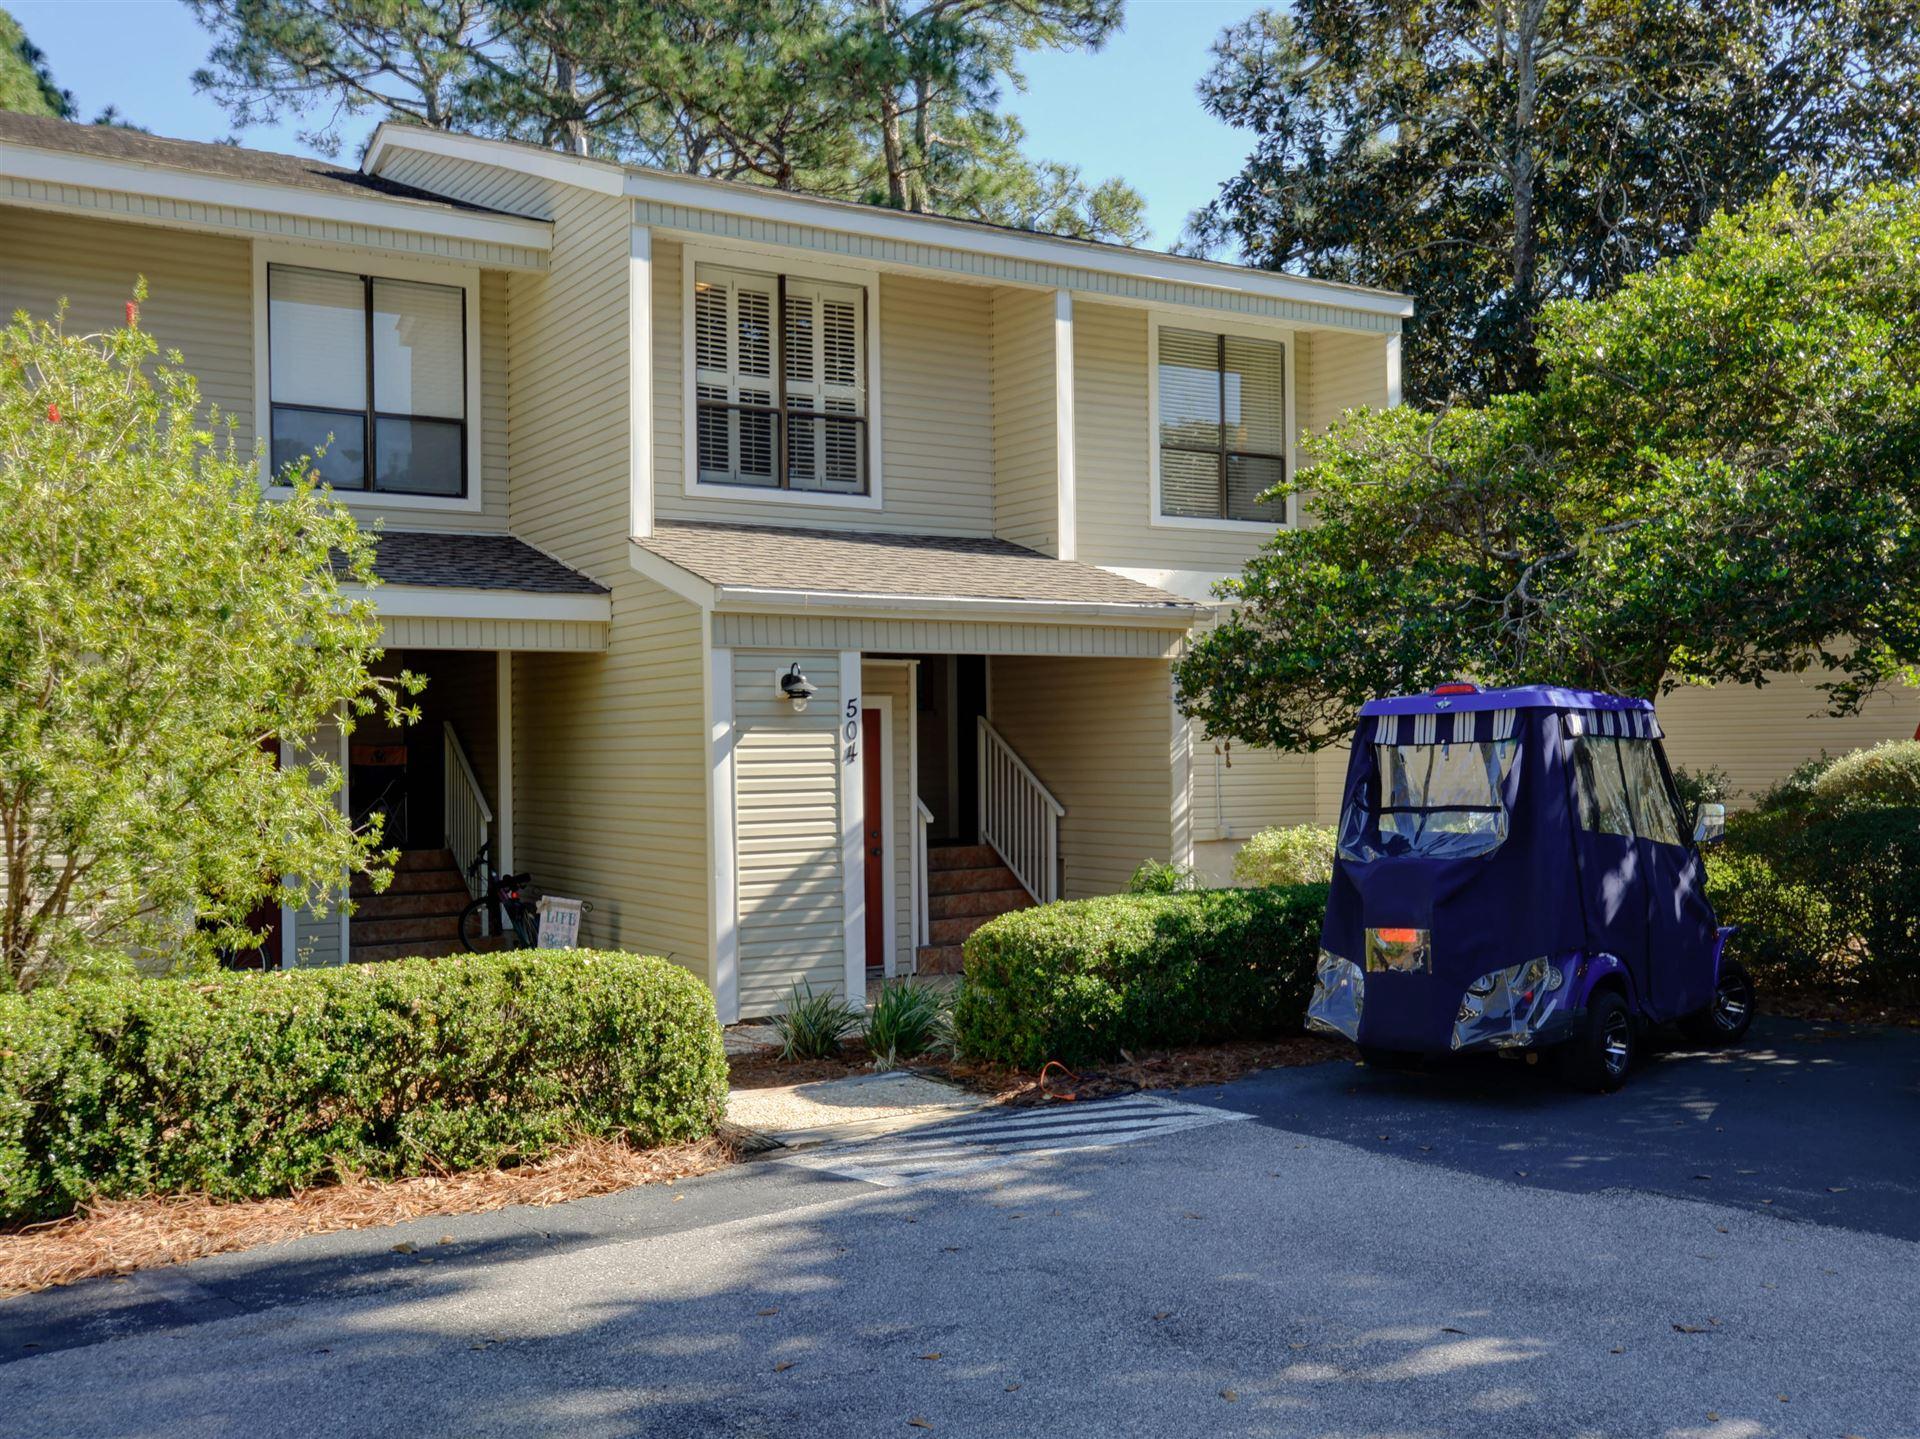 Photo for 504 Magnolia Place #504, Miramar Beach, FL 32550 (MLS # 813598)